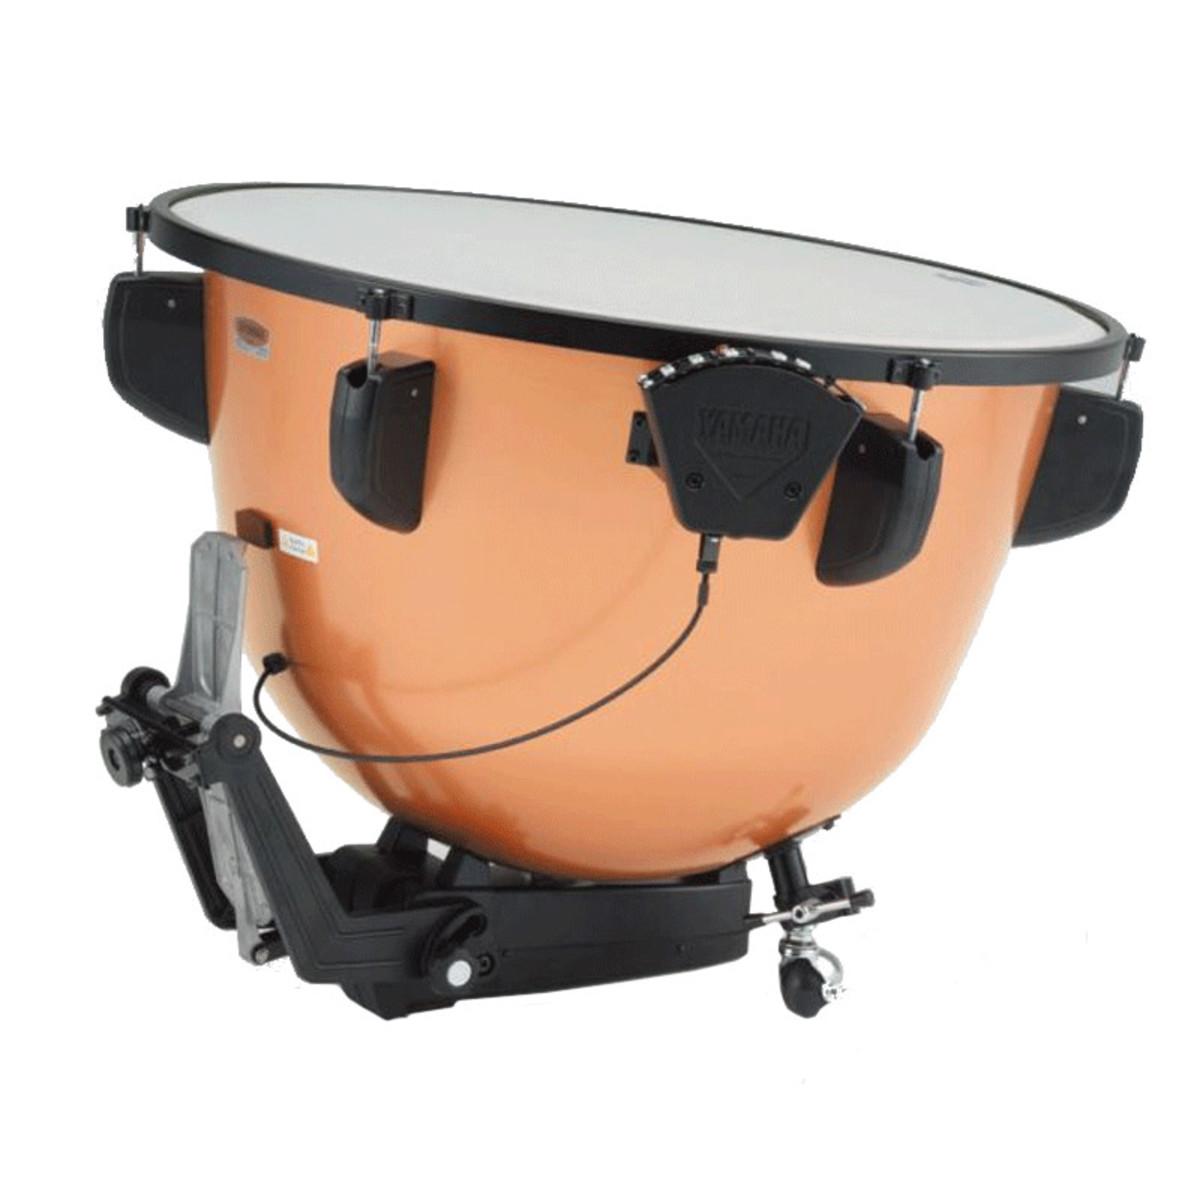 Yamaha tp 3126 portable timpani 26 inch at for Yamaha portable drums